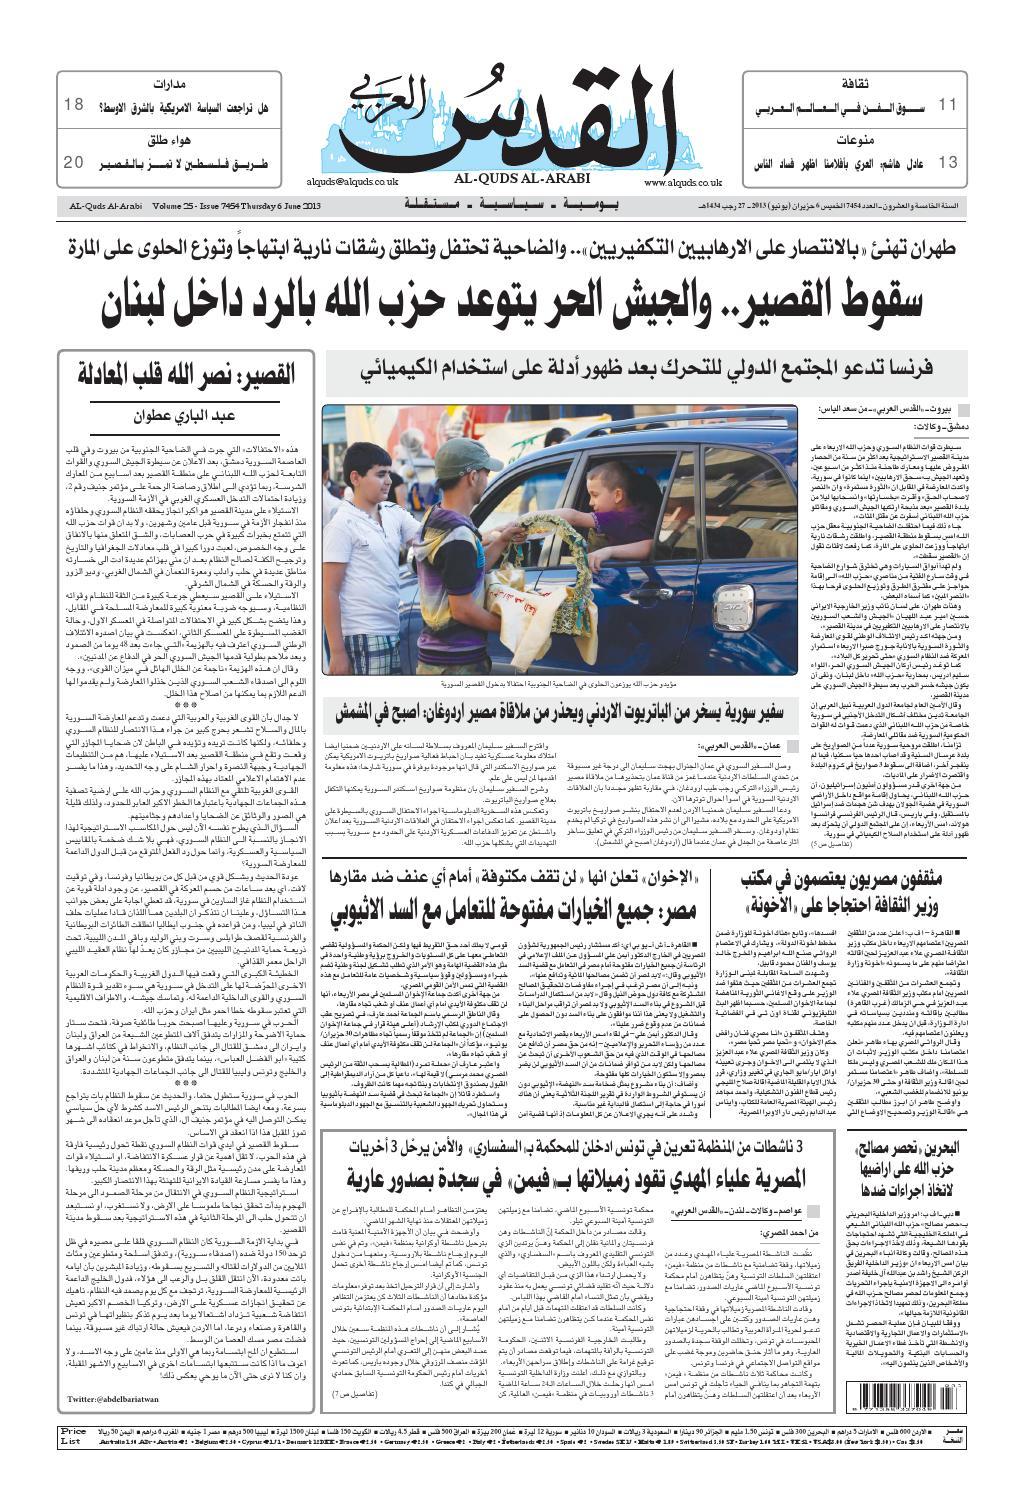 767ee444f صحيفة القدس العربي , الخميس 06.06.2013 by مركز الحدث - issuu